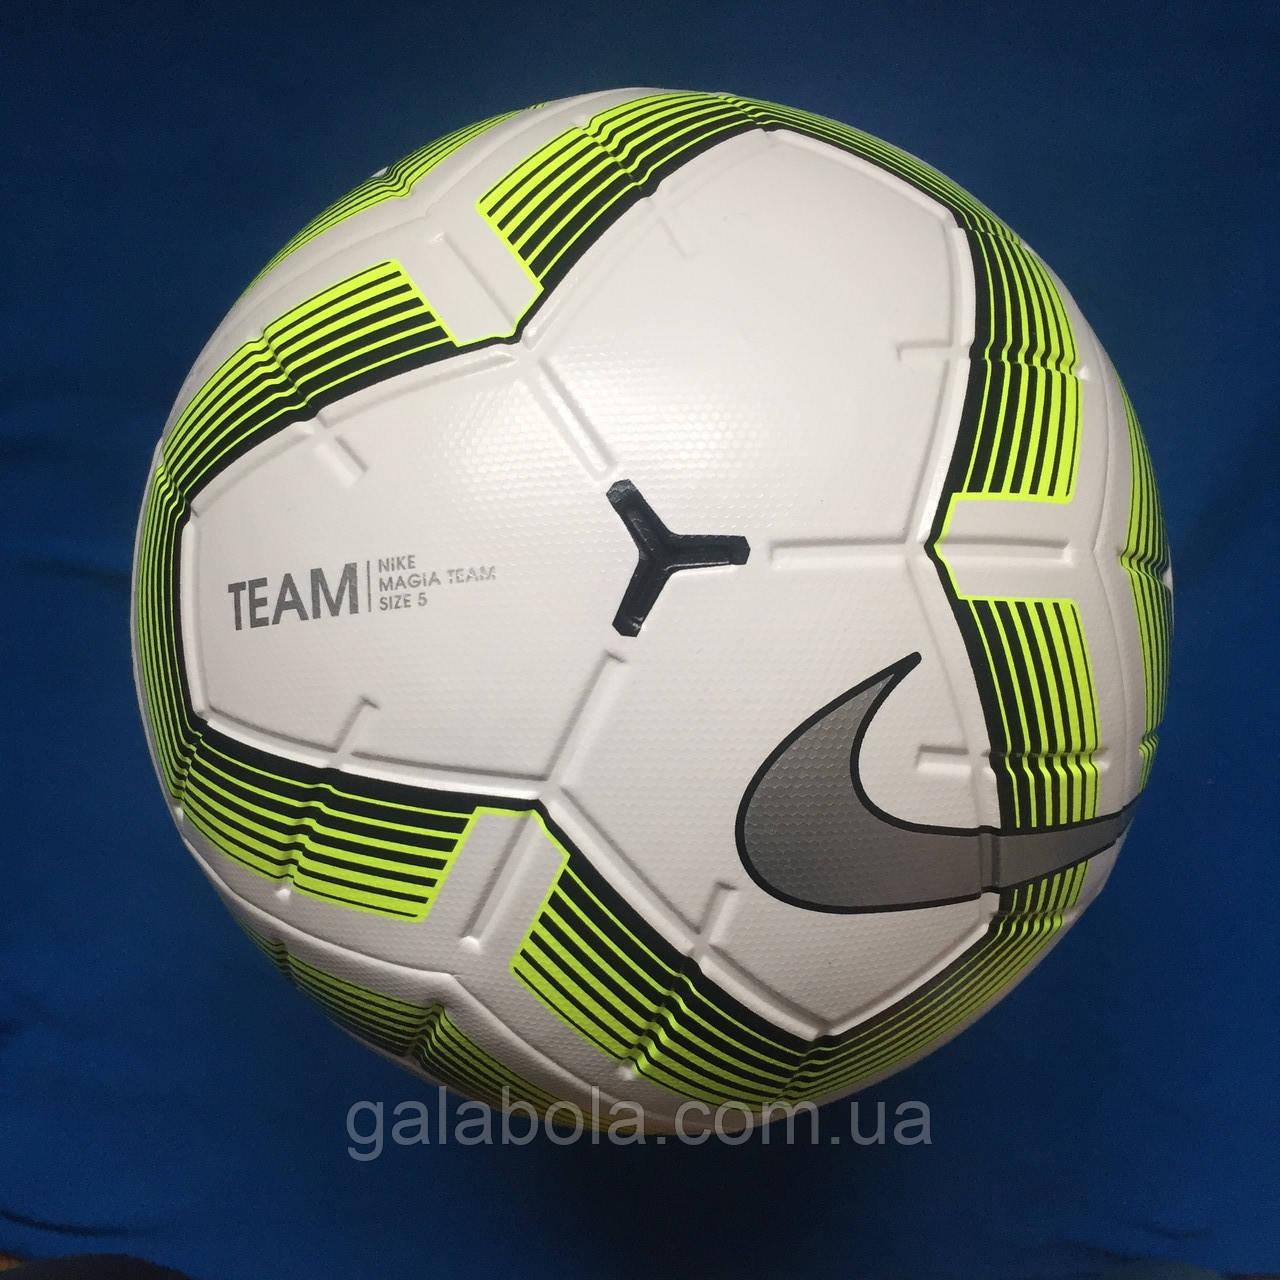 8155c712 Мяч футбольный NIKE MAGIA TEAM II FIFA SC3536-100 (размер 5), ...